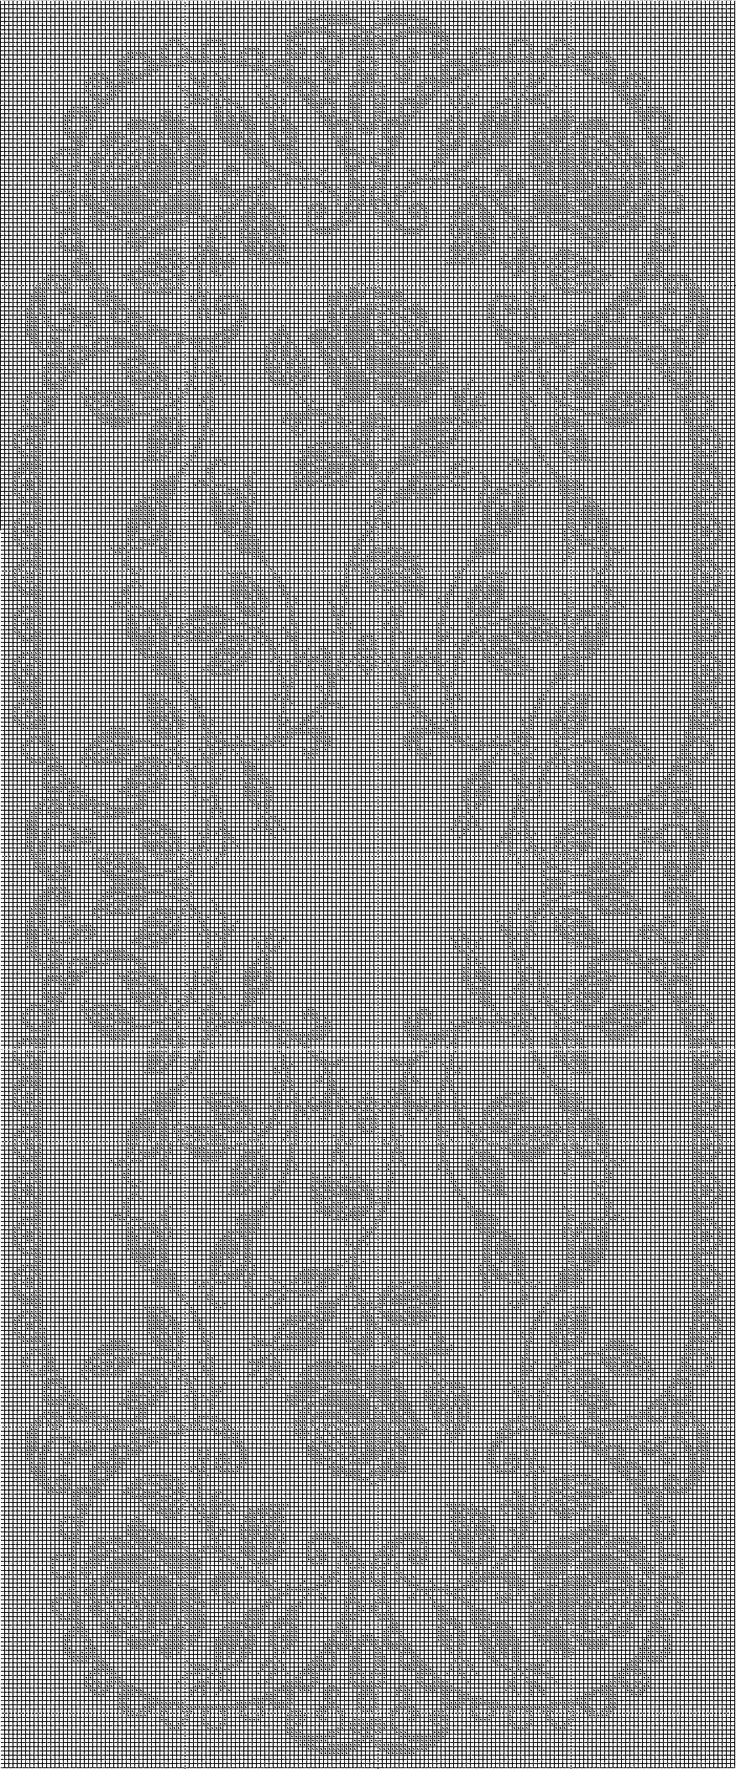 1310 best images about Filet crochet on Pinterest